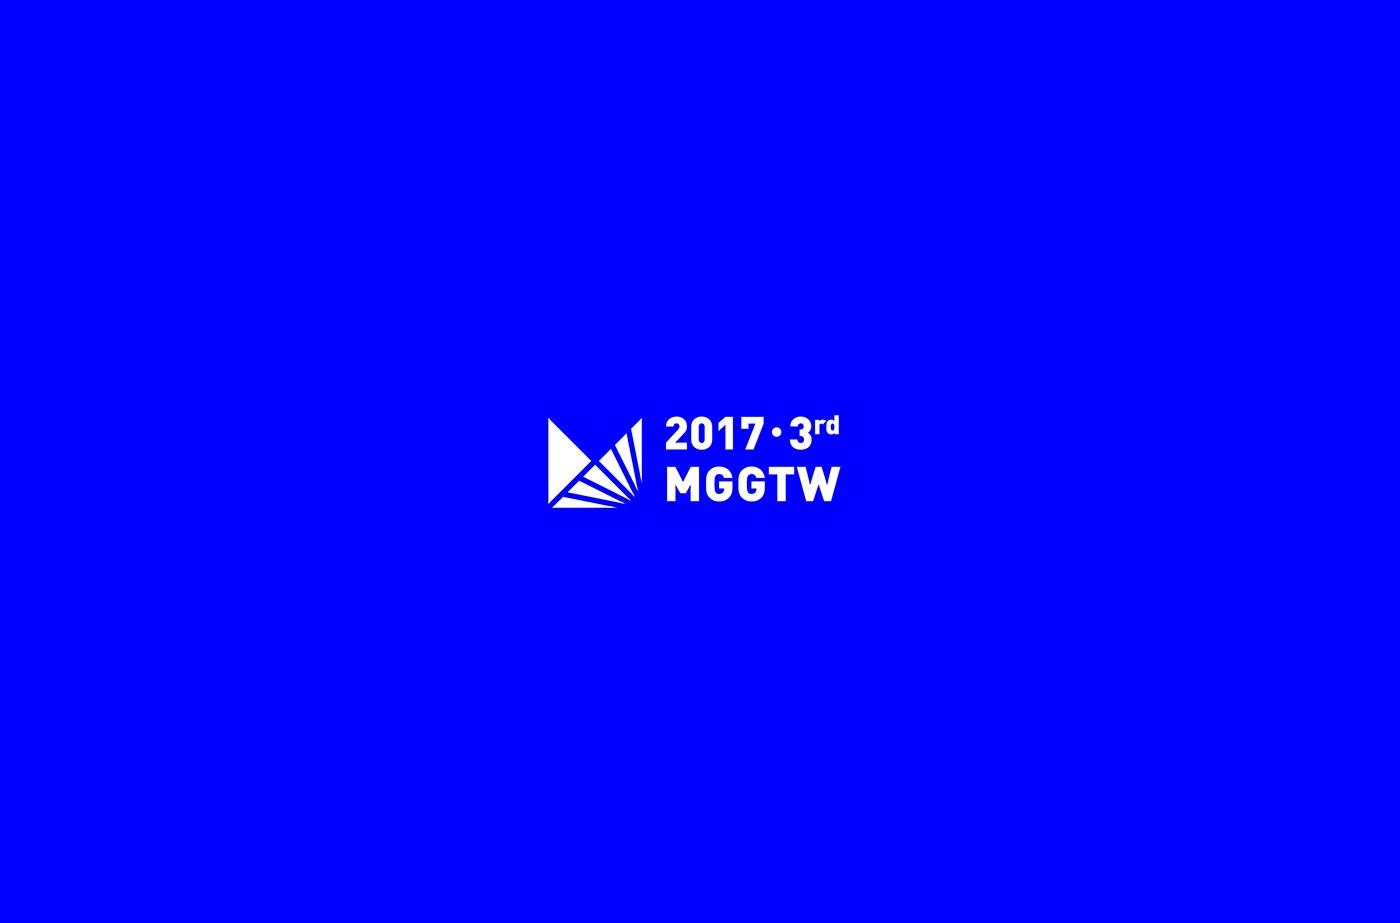 2017 MGGTW 3rd on Behance